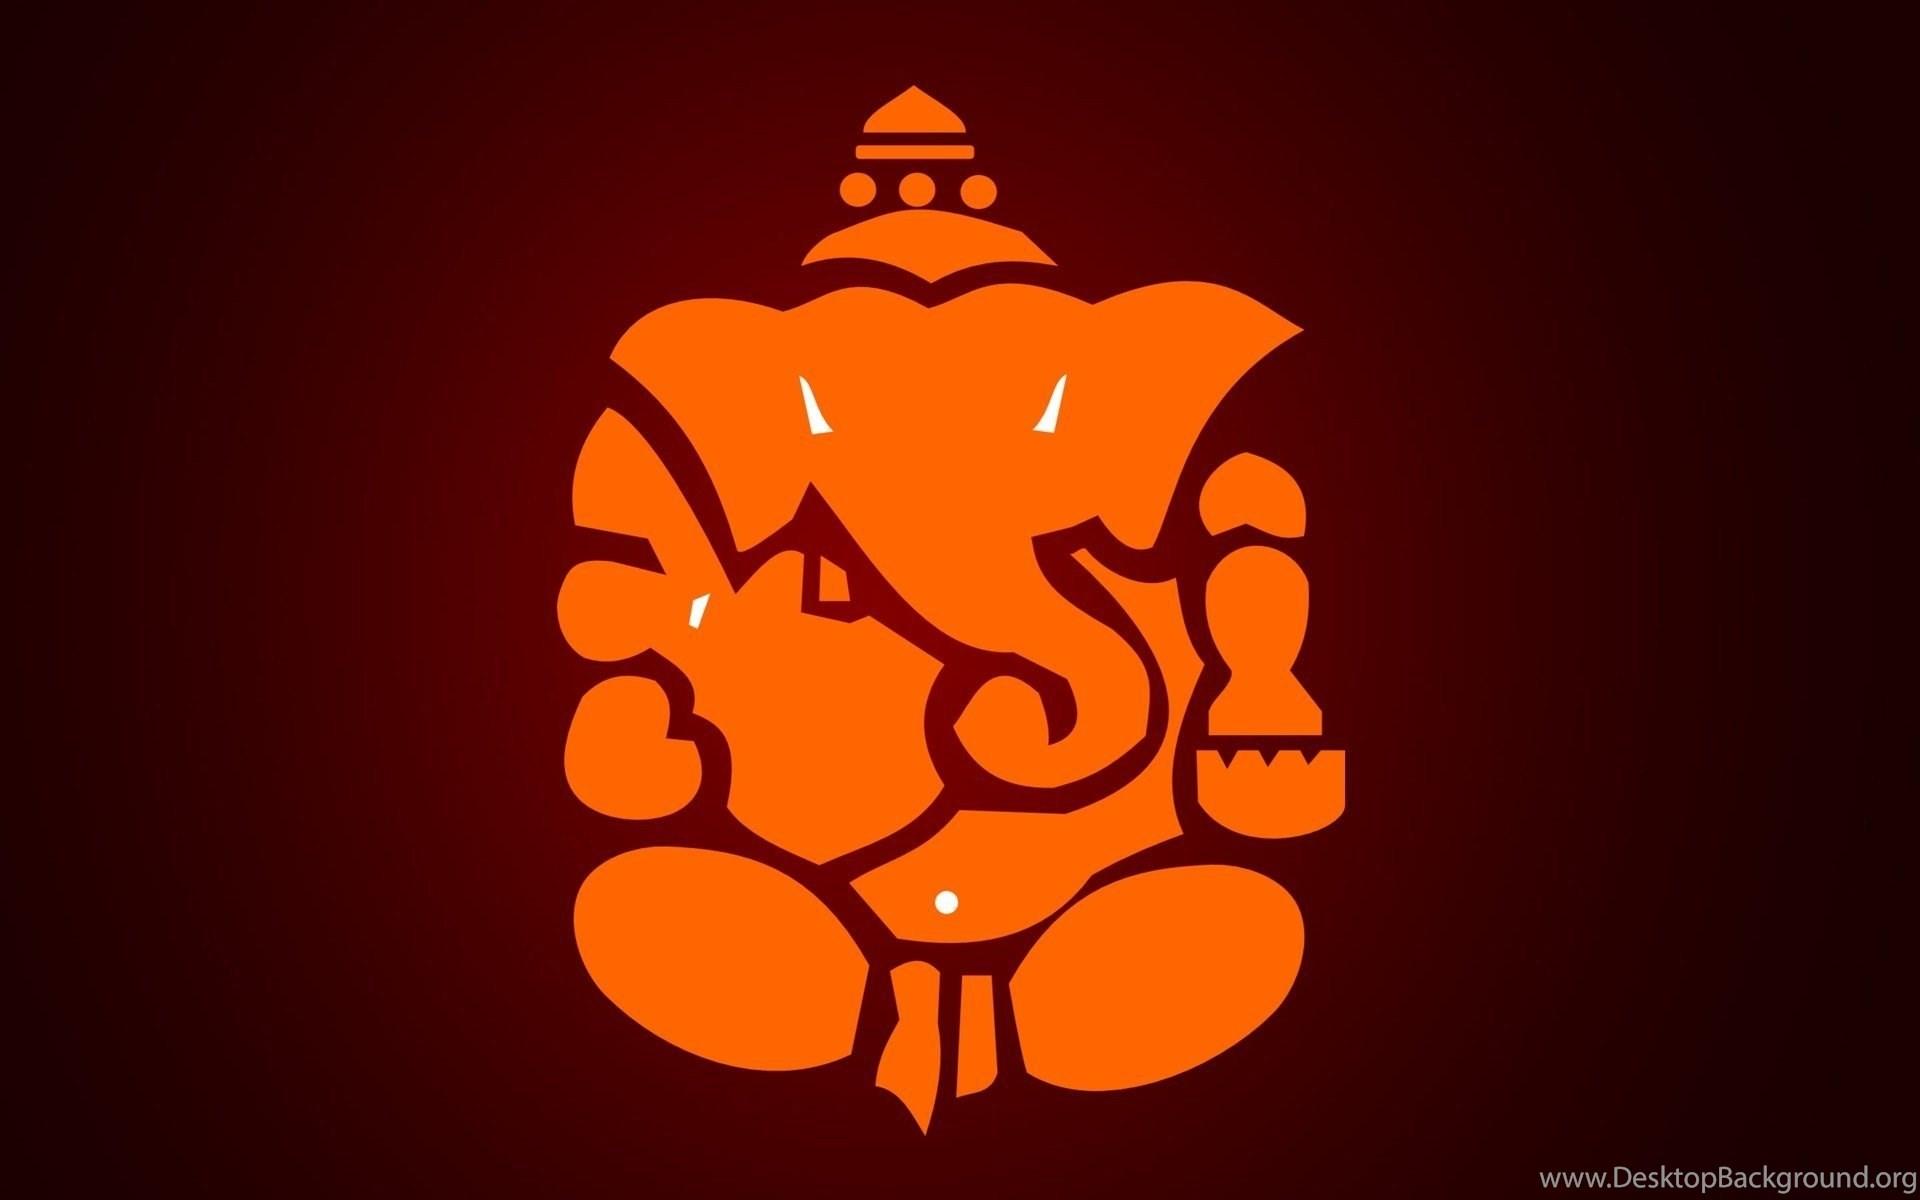 3d Lord Ganesha: Shree Ganesha Hd Wallpapers Free Download 1080p Desktop